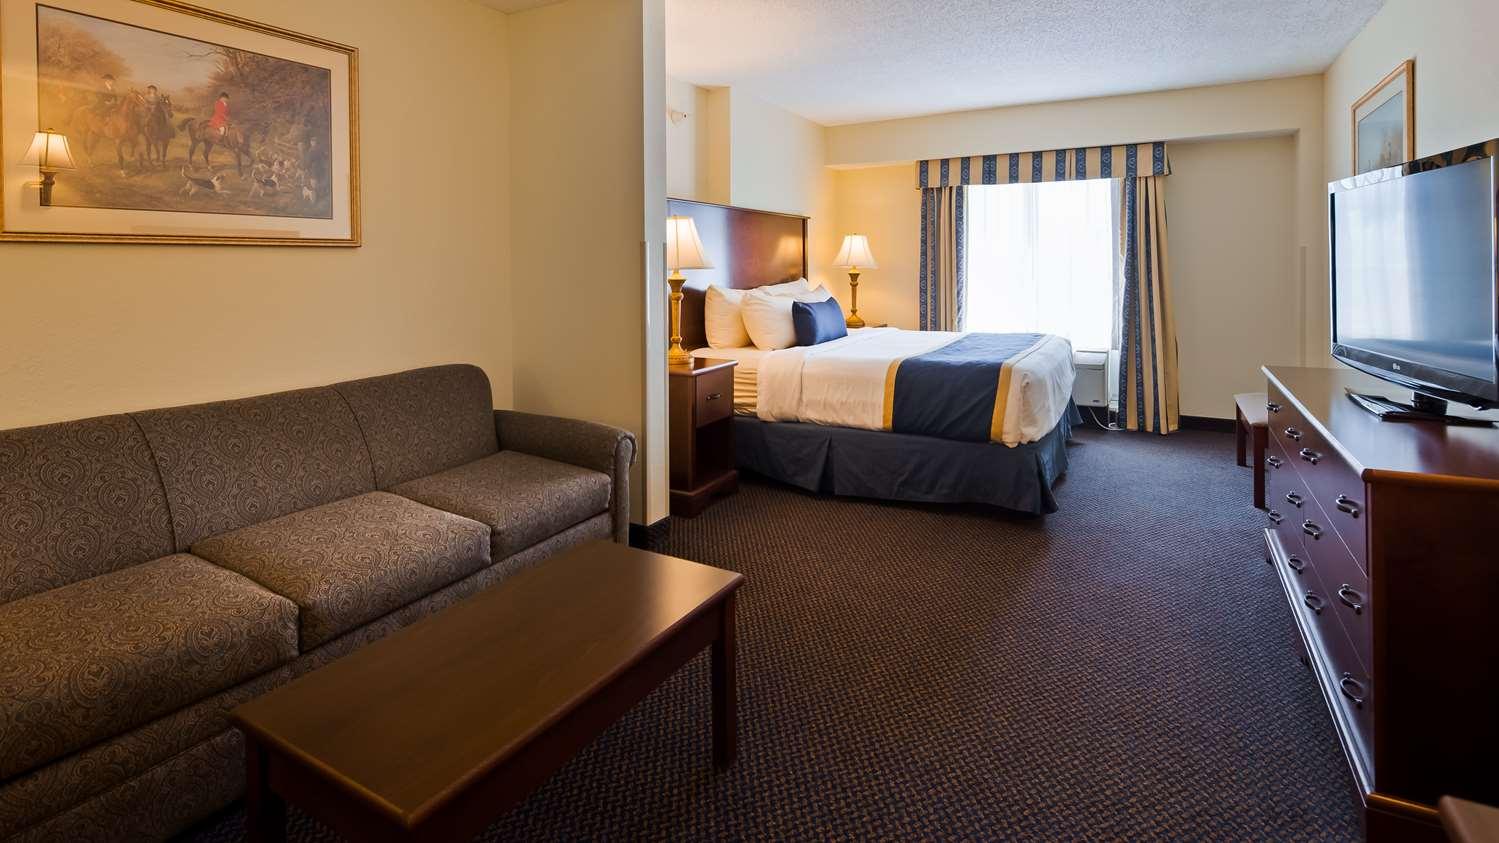 Best Western Plus Crossroads Inn & Suites Gordonsville, VA - See ...